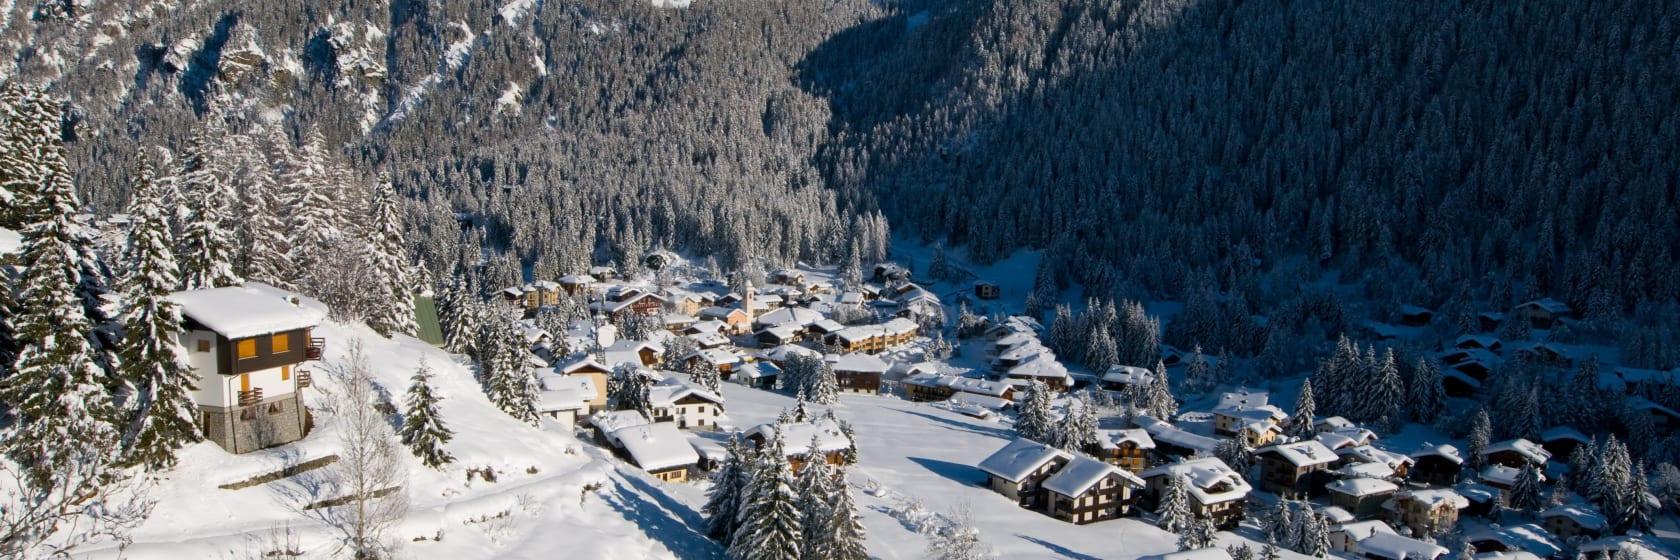 Landsby i bjergene med blå himmel i Italien